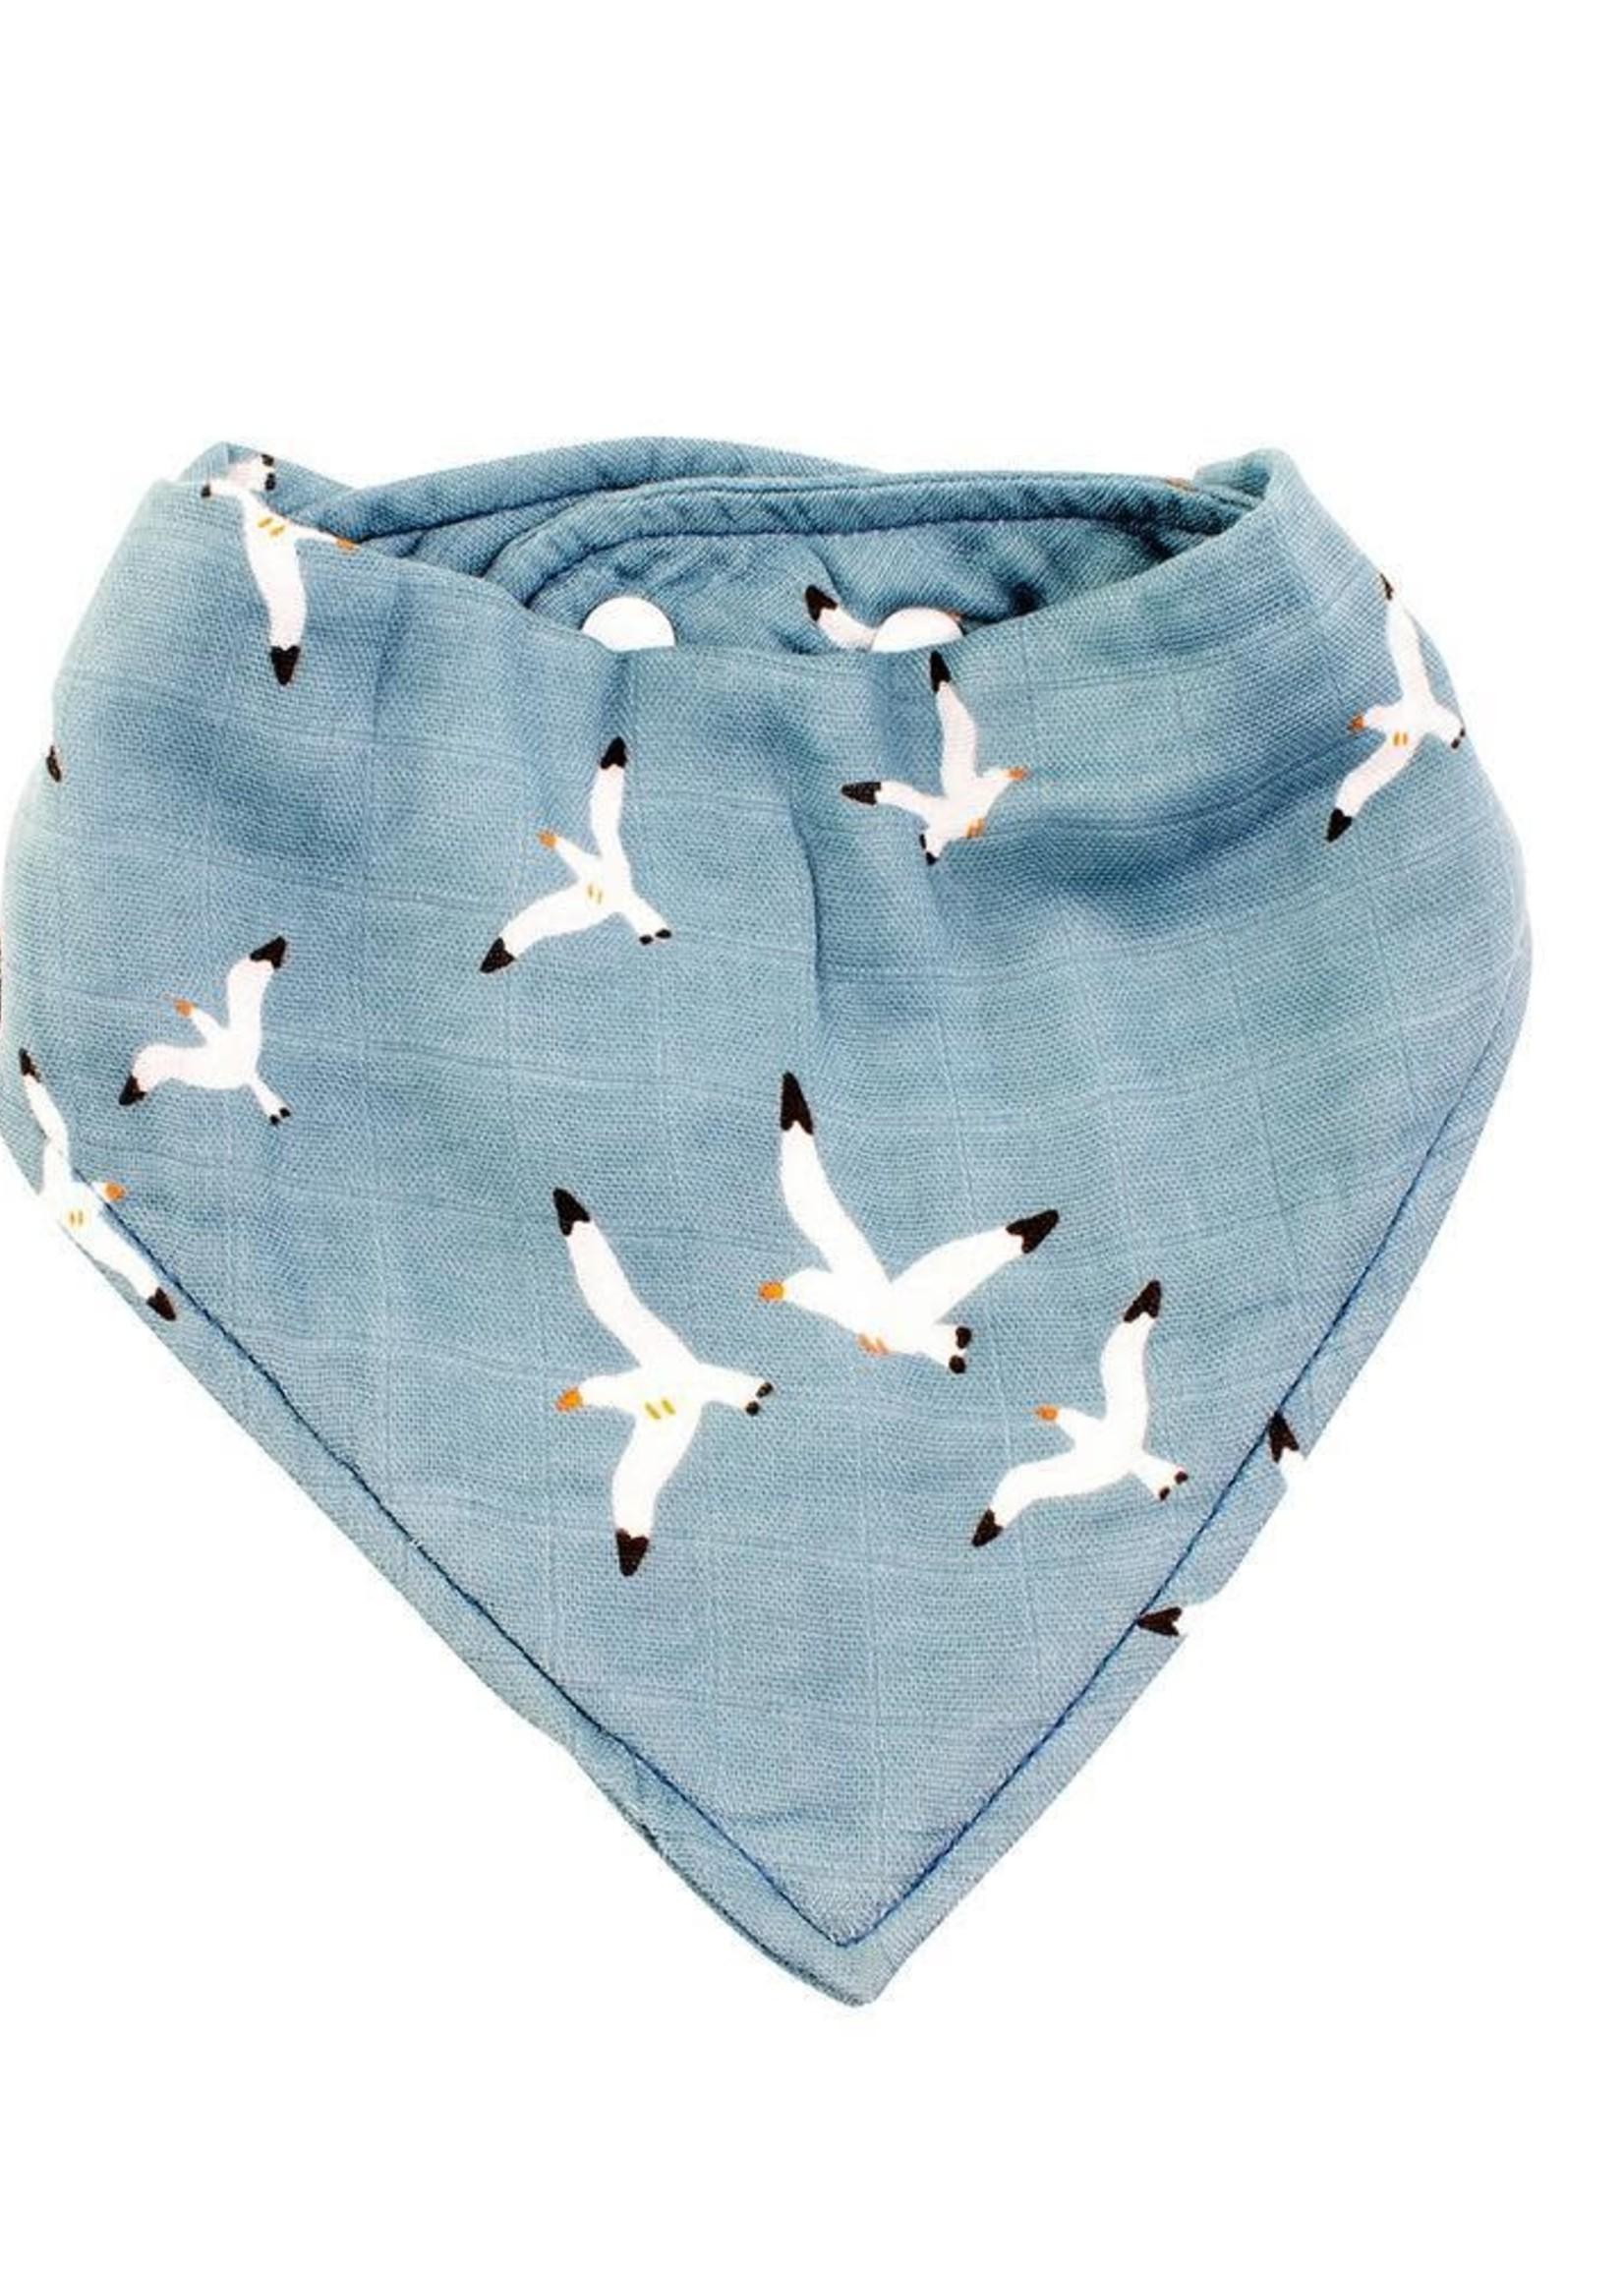 Bebe Au Lait Seagulls Oh-So-Soft Muslin Bandana Bib